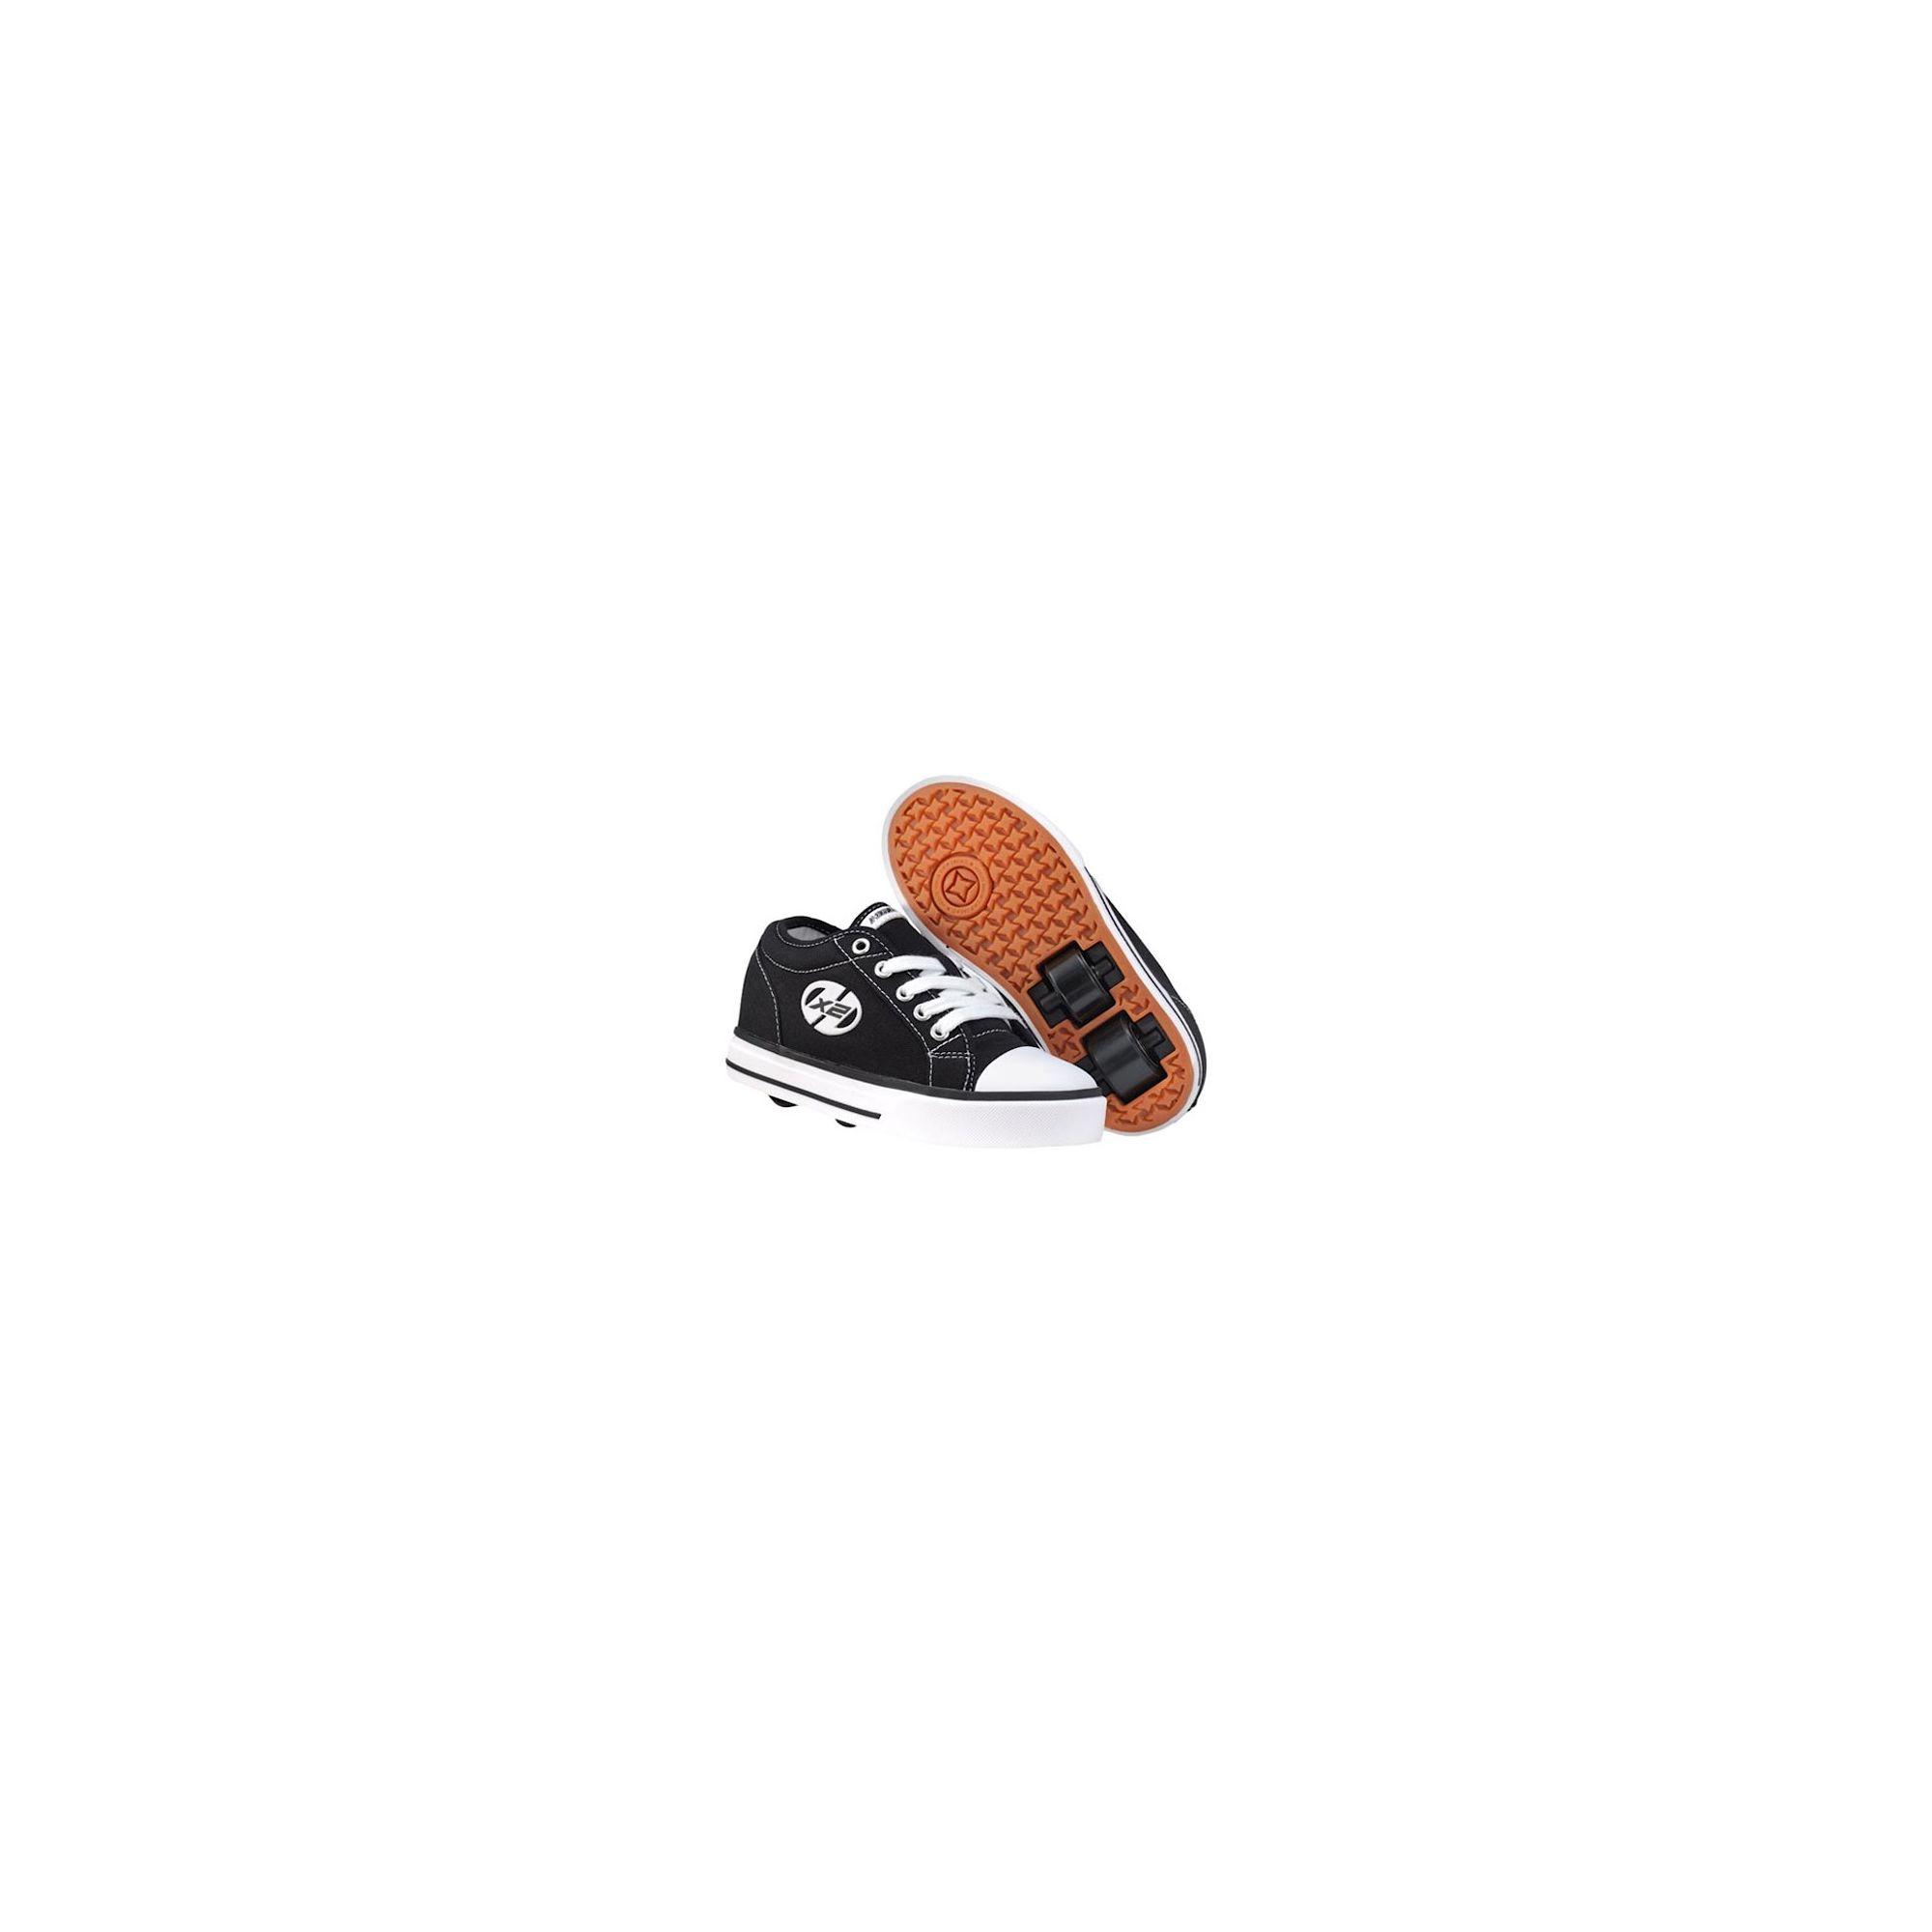 Sport > Skates